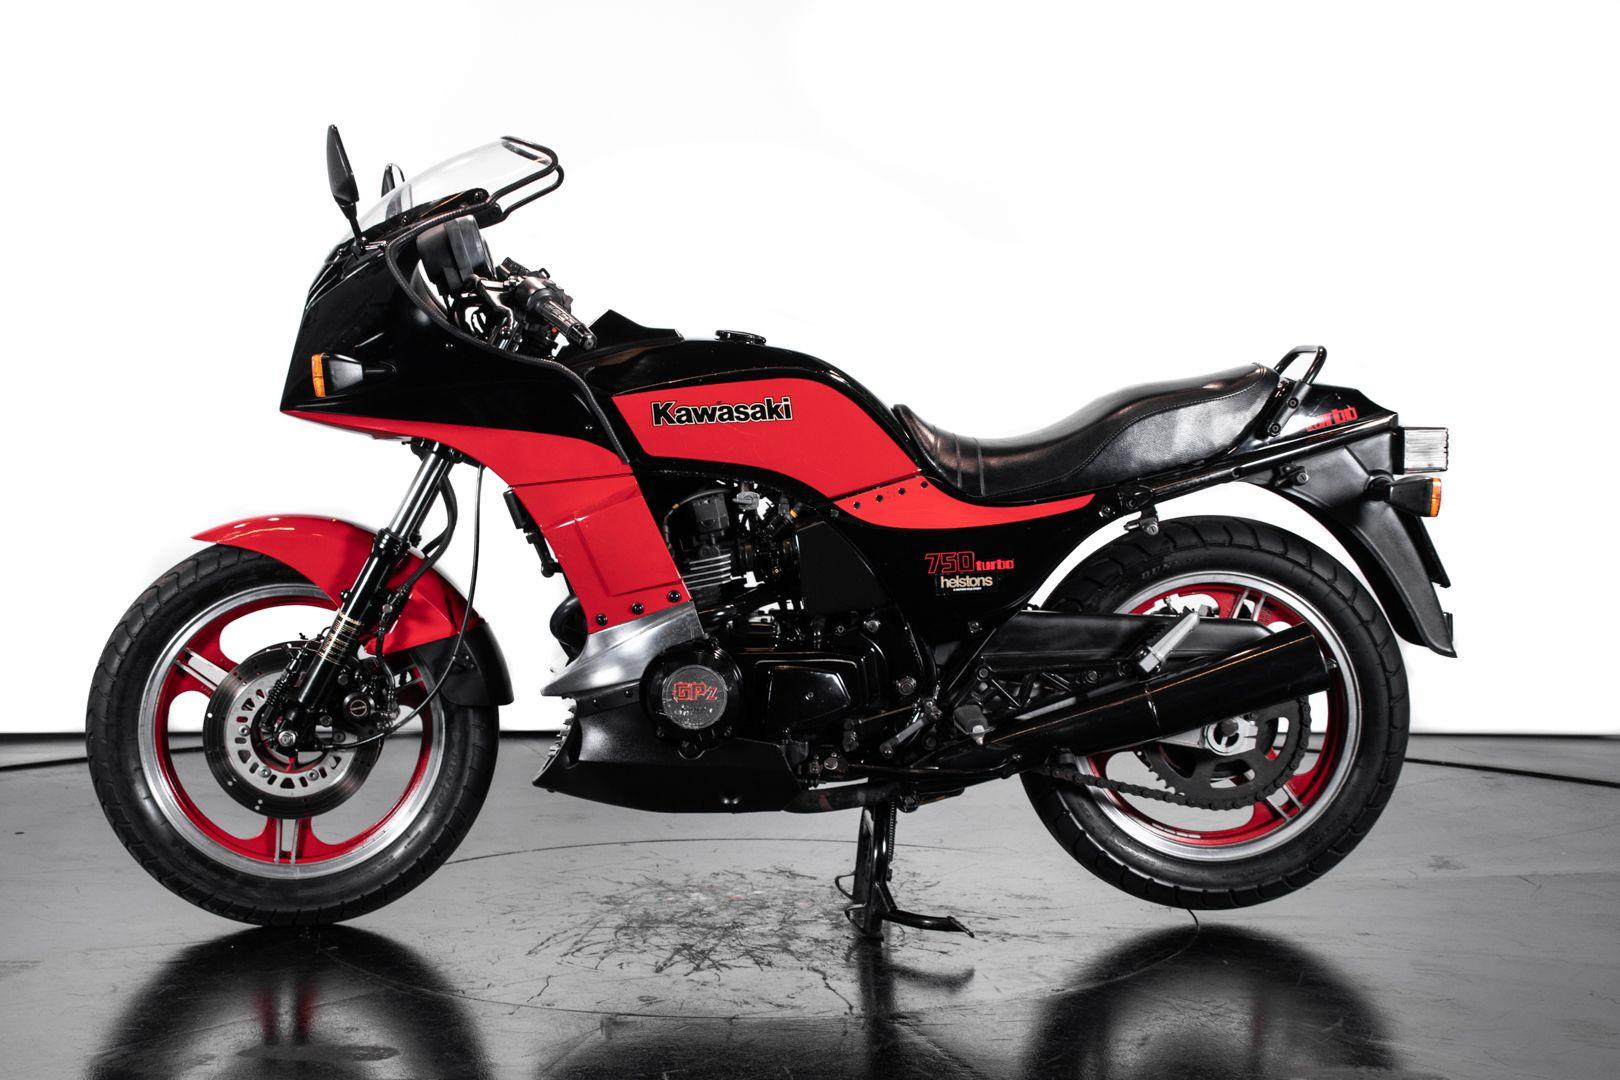 1985 Kawasaki Turbo 750 84965